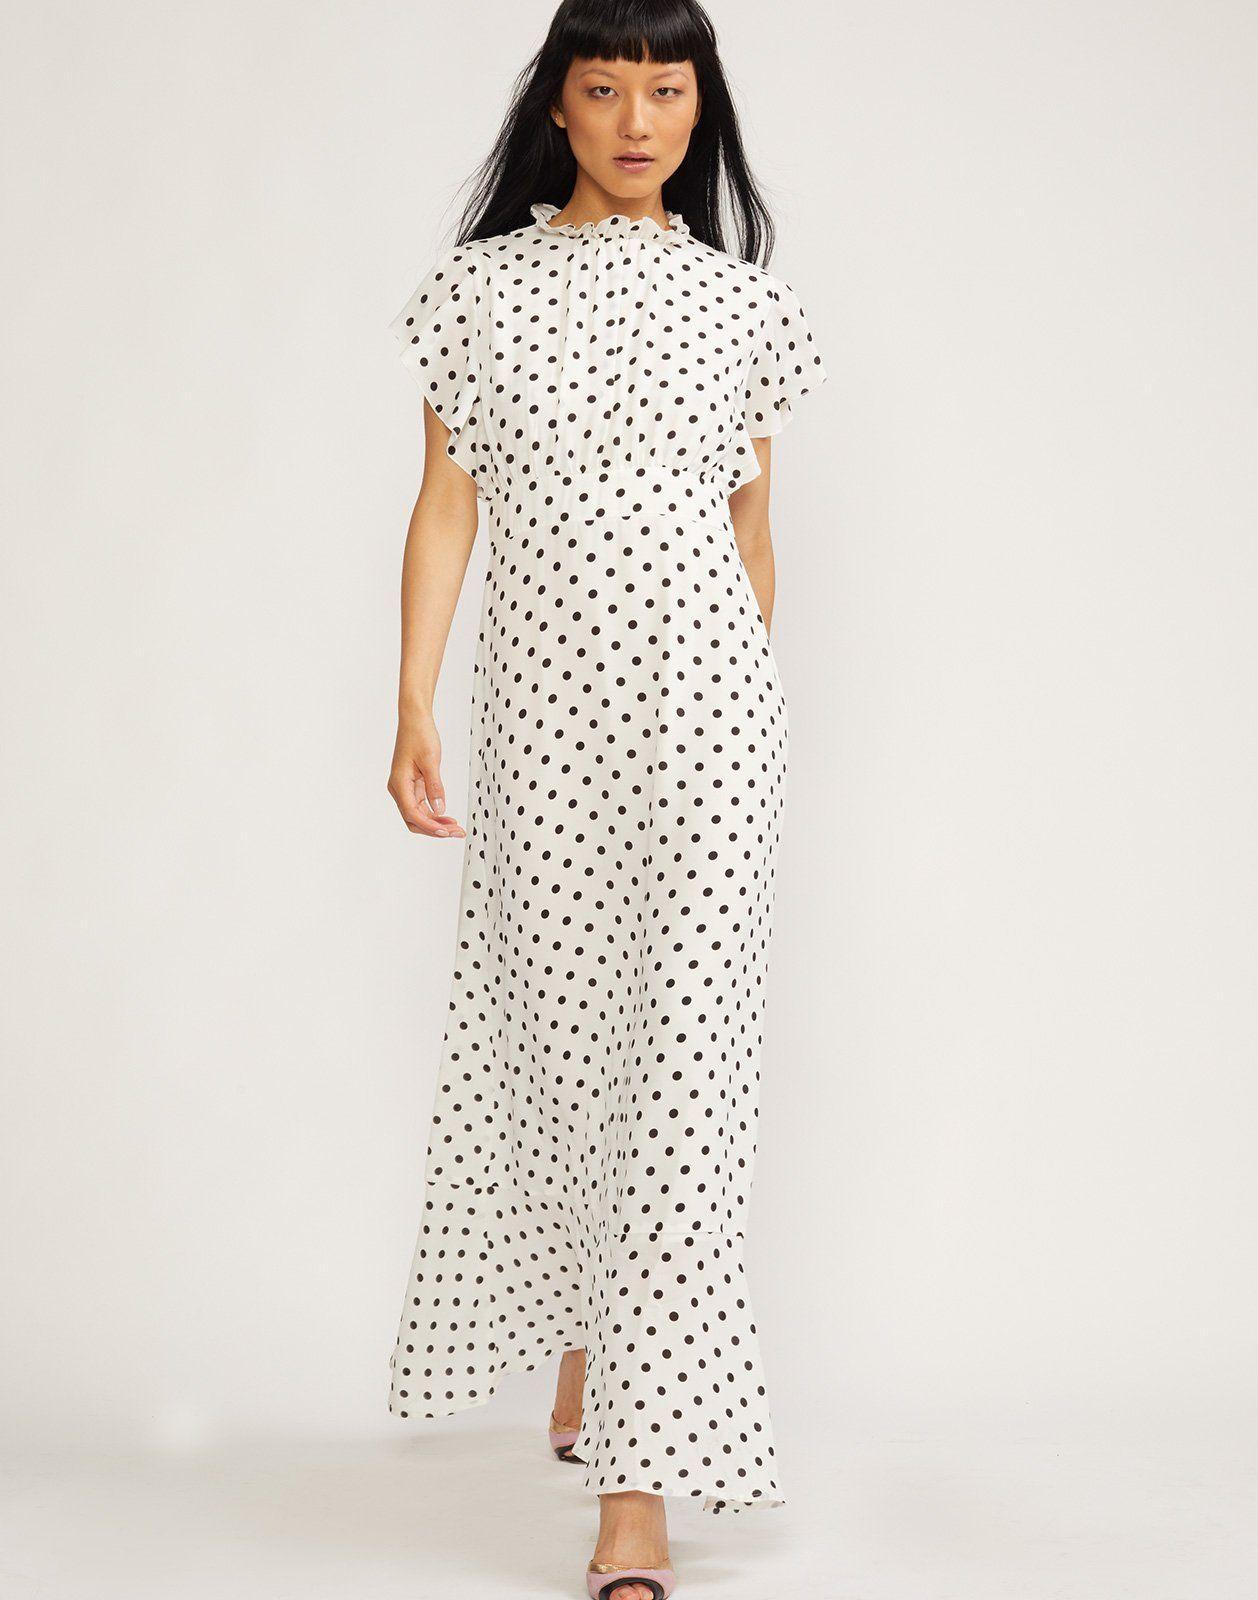 3d95208590df32 Cynthia Rowley Talia maxi dress in polka dot print.